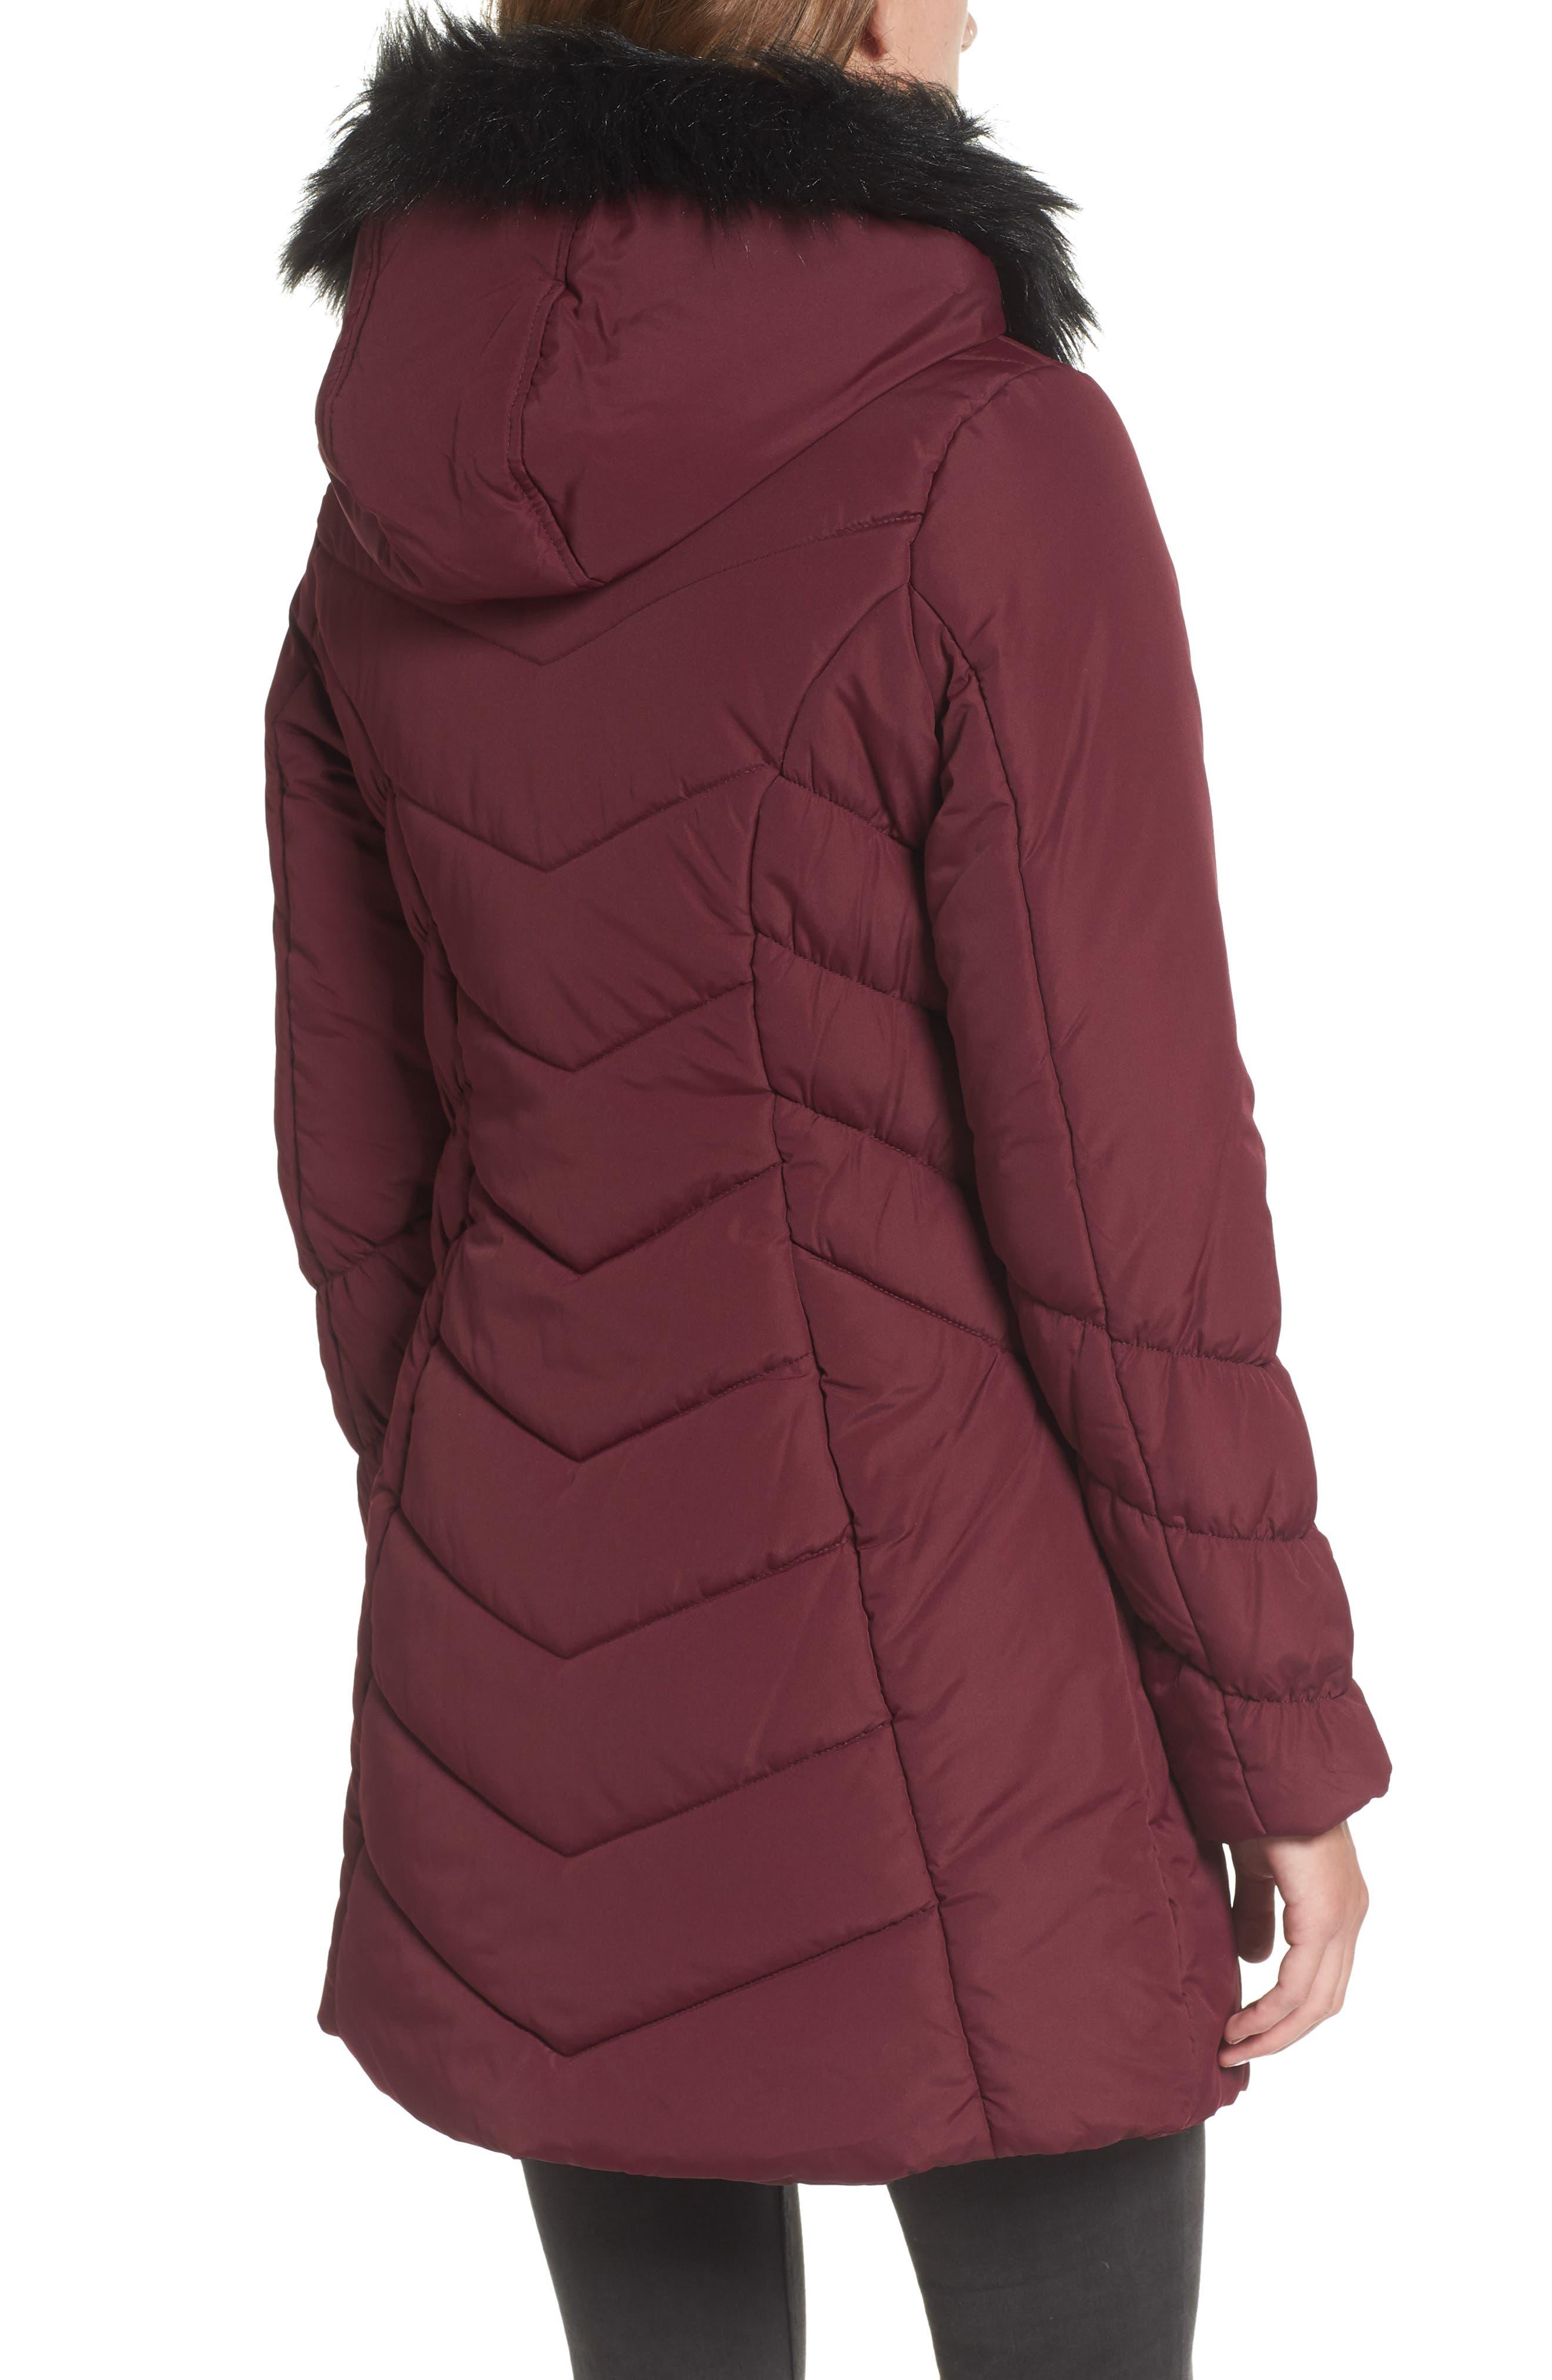 Alternate Image 2  - Maralyn & Me Faux Fur Trim Hooded Puffer Jacket